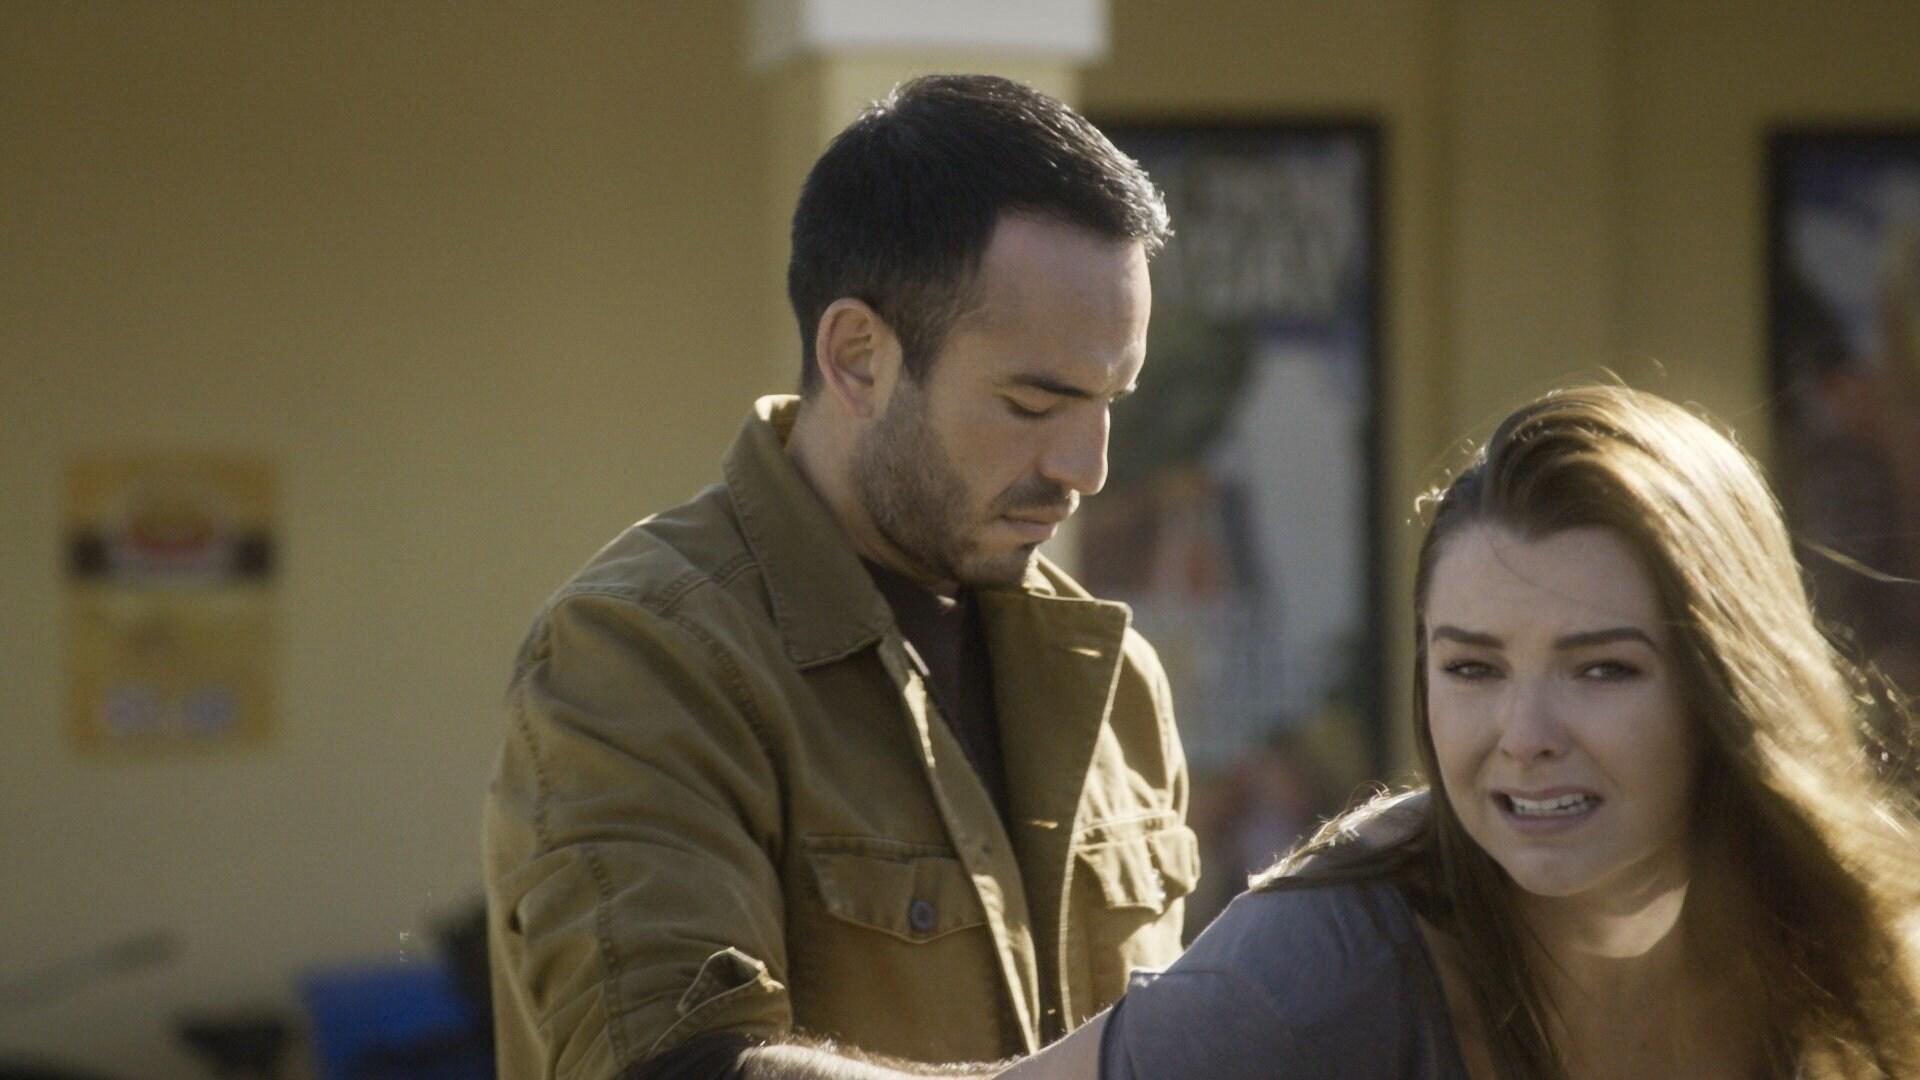 Joel arresta a Sofía